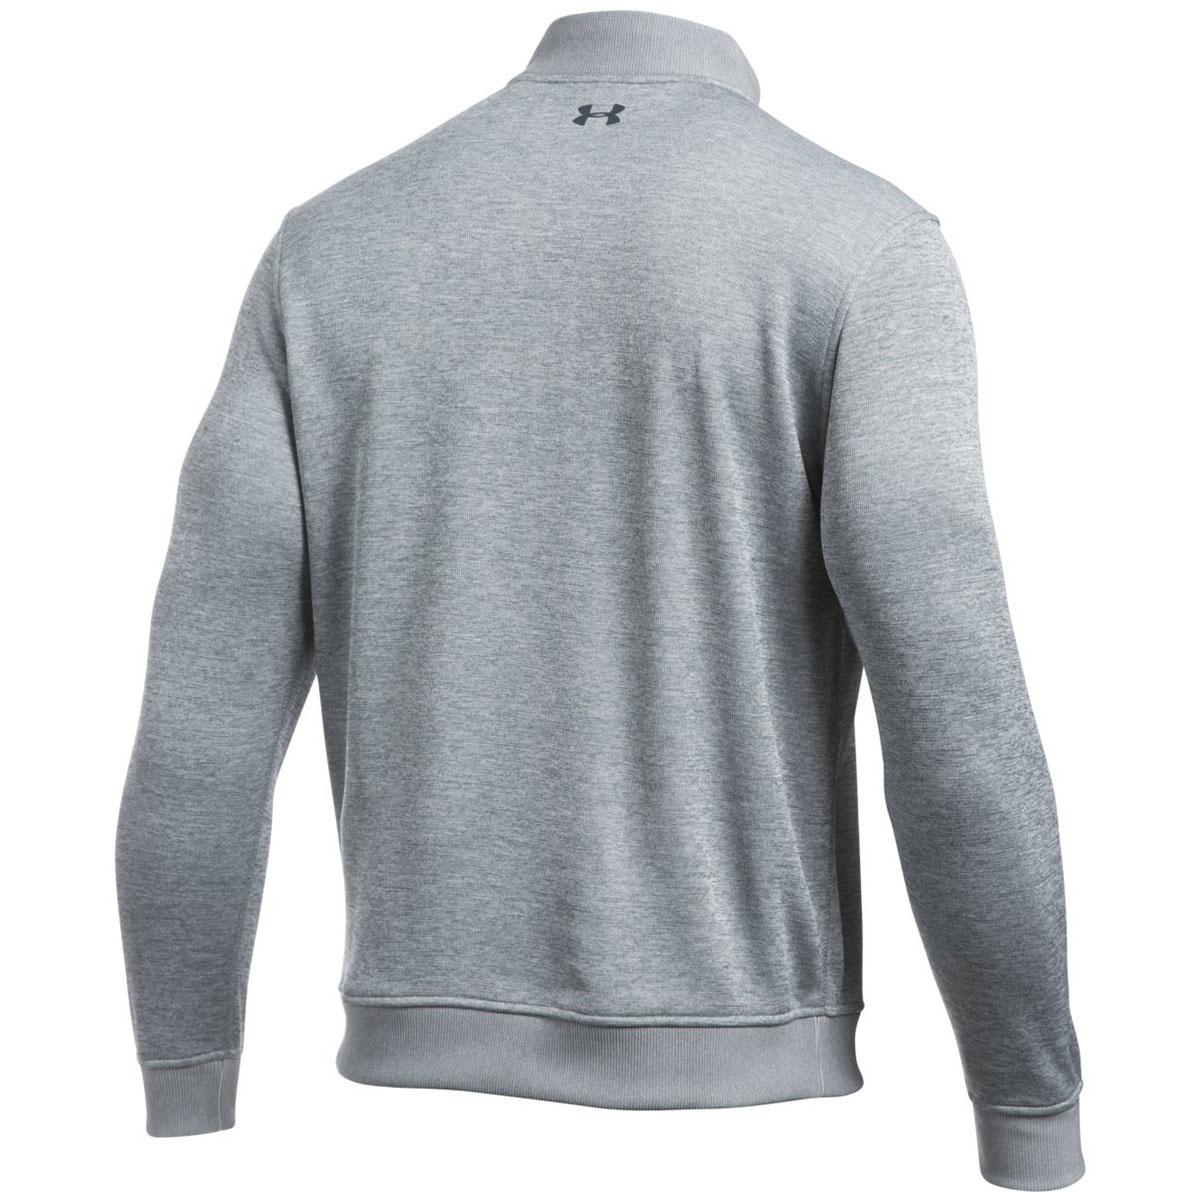 Under-Armour-Mens-UA-Storm-Sweater-Fleece-1-4-Zip-Pullover-Jumper-25-OFF-RRP thumbnail 32